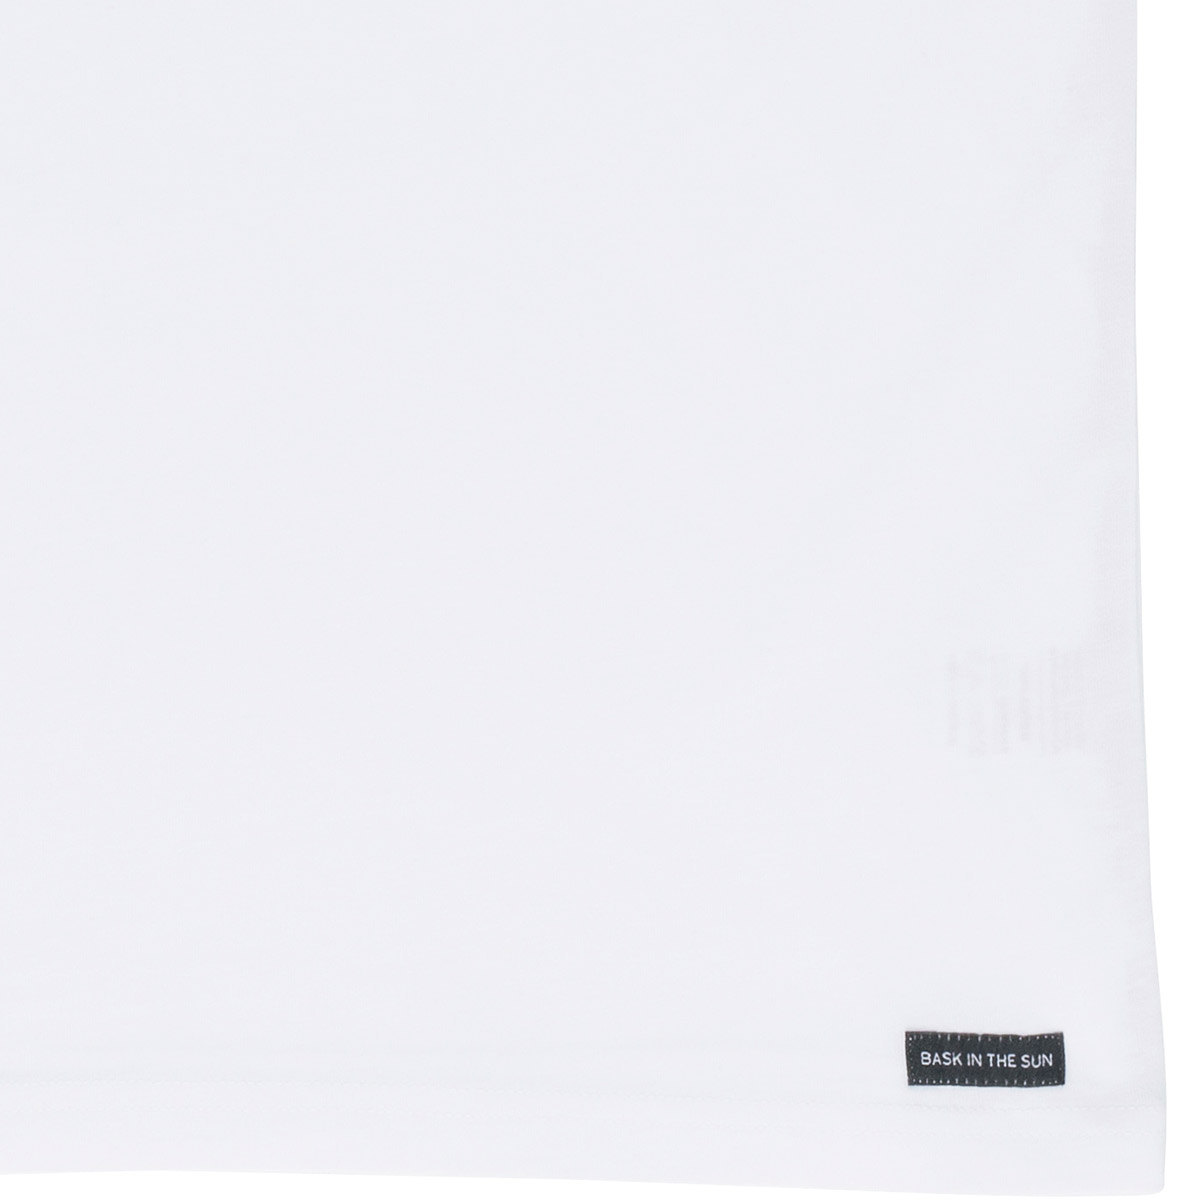 T-shirt en coton bio teofilo - Bask in the Sun num 2